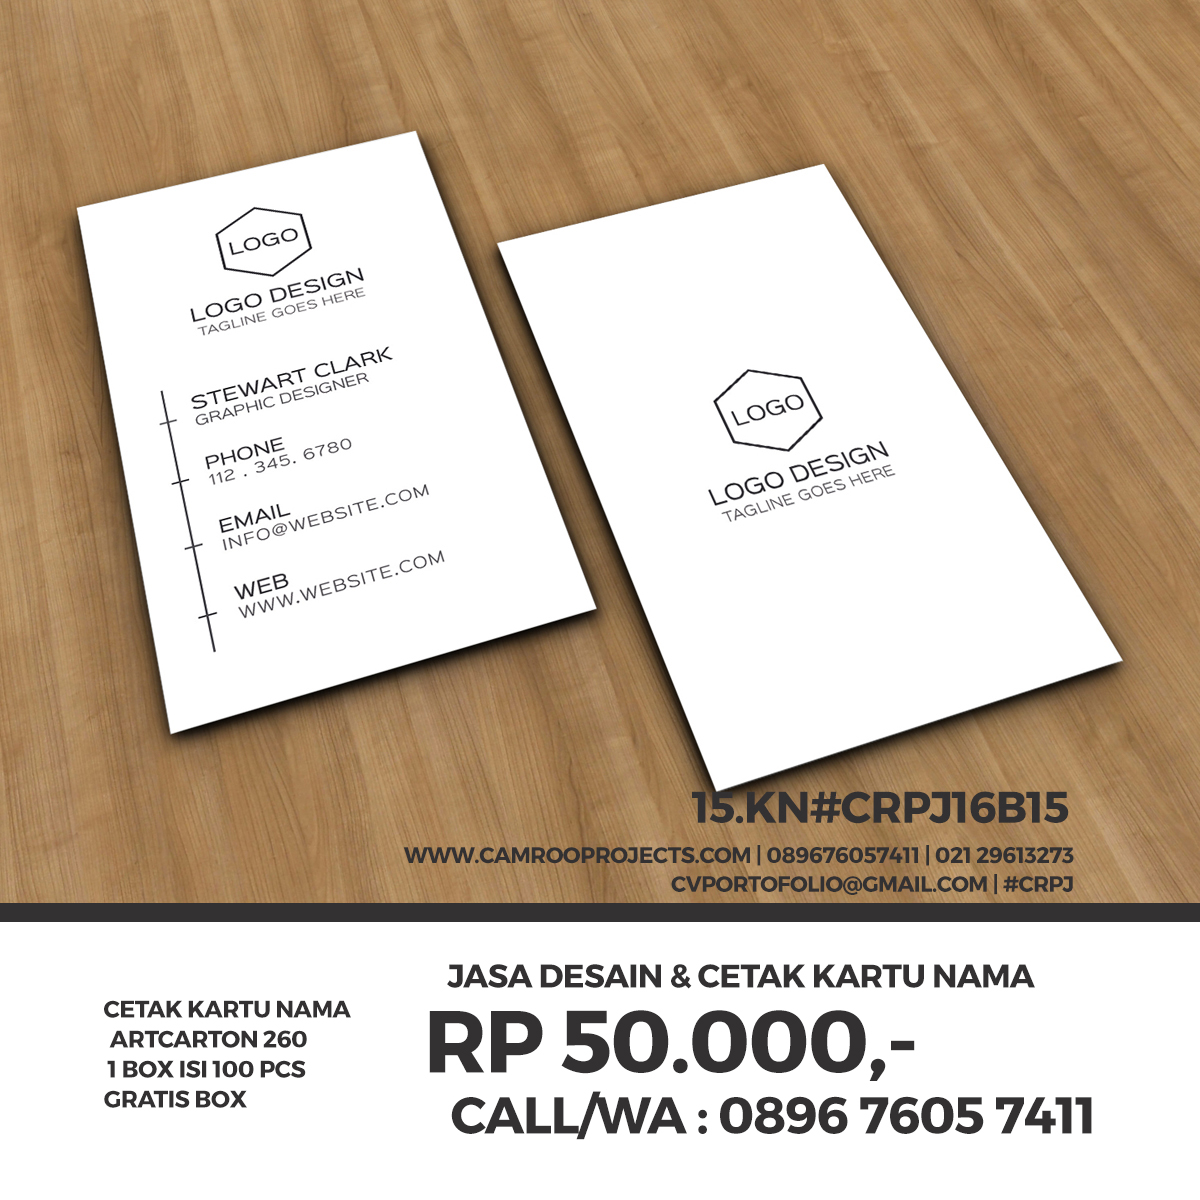 Jasa Desain Kartu Nama | murah | Call/WA 0896 760 574 11